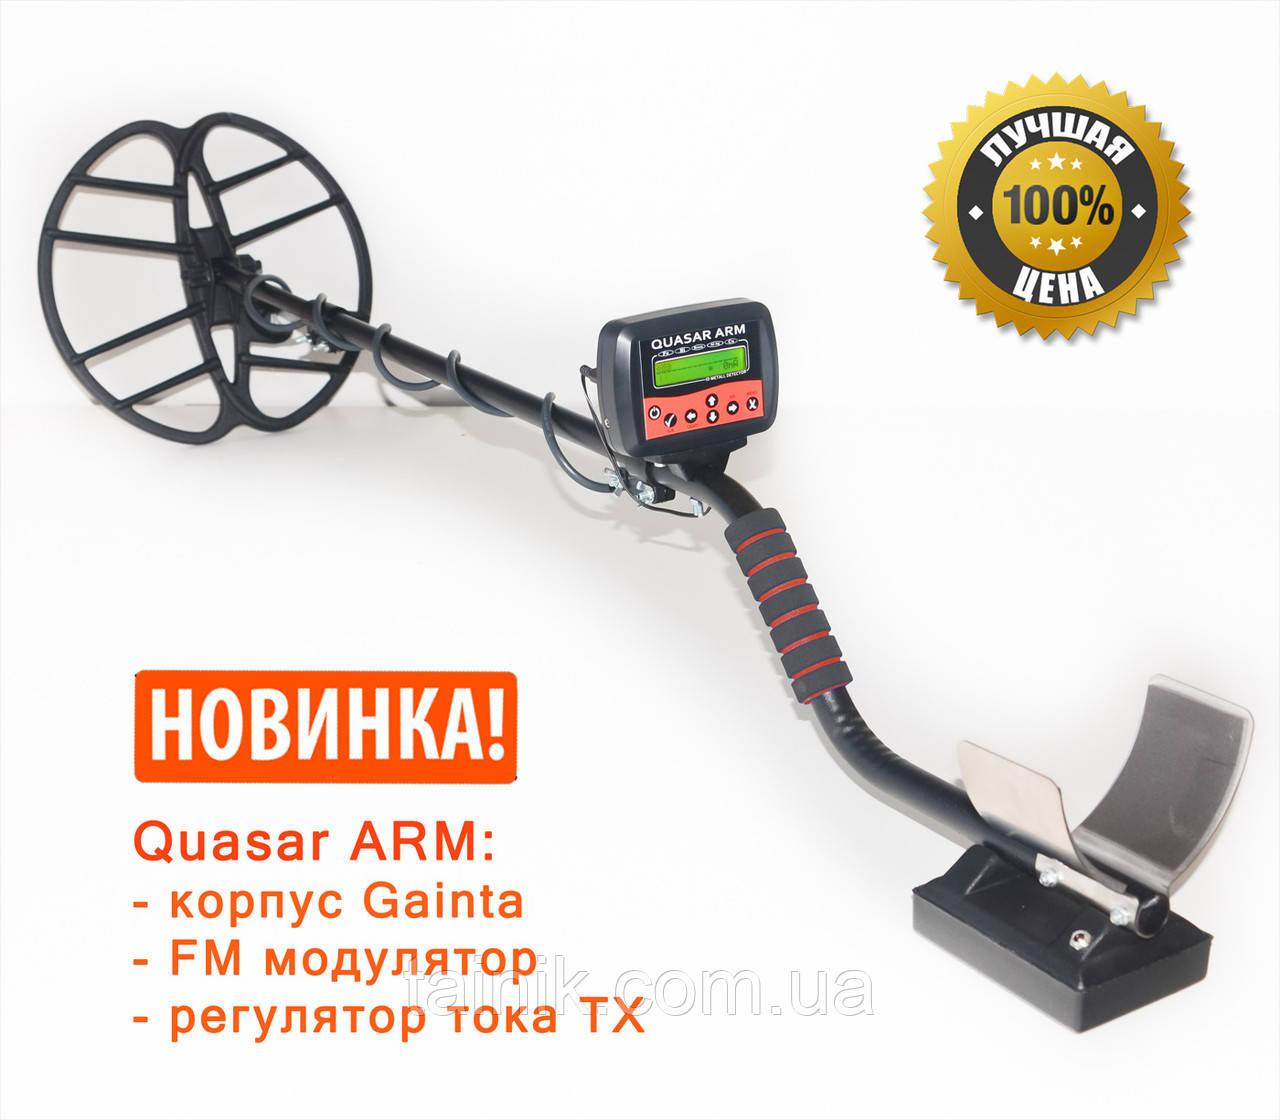 СКИДКА! Металлоискатель Квазар АРМ/Quasar ARM корпус gainta 1910 c FM трансмиттером и регулятором тока ТХ